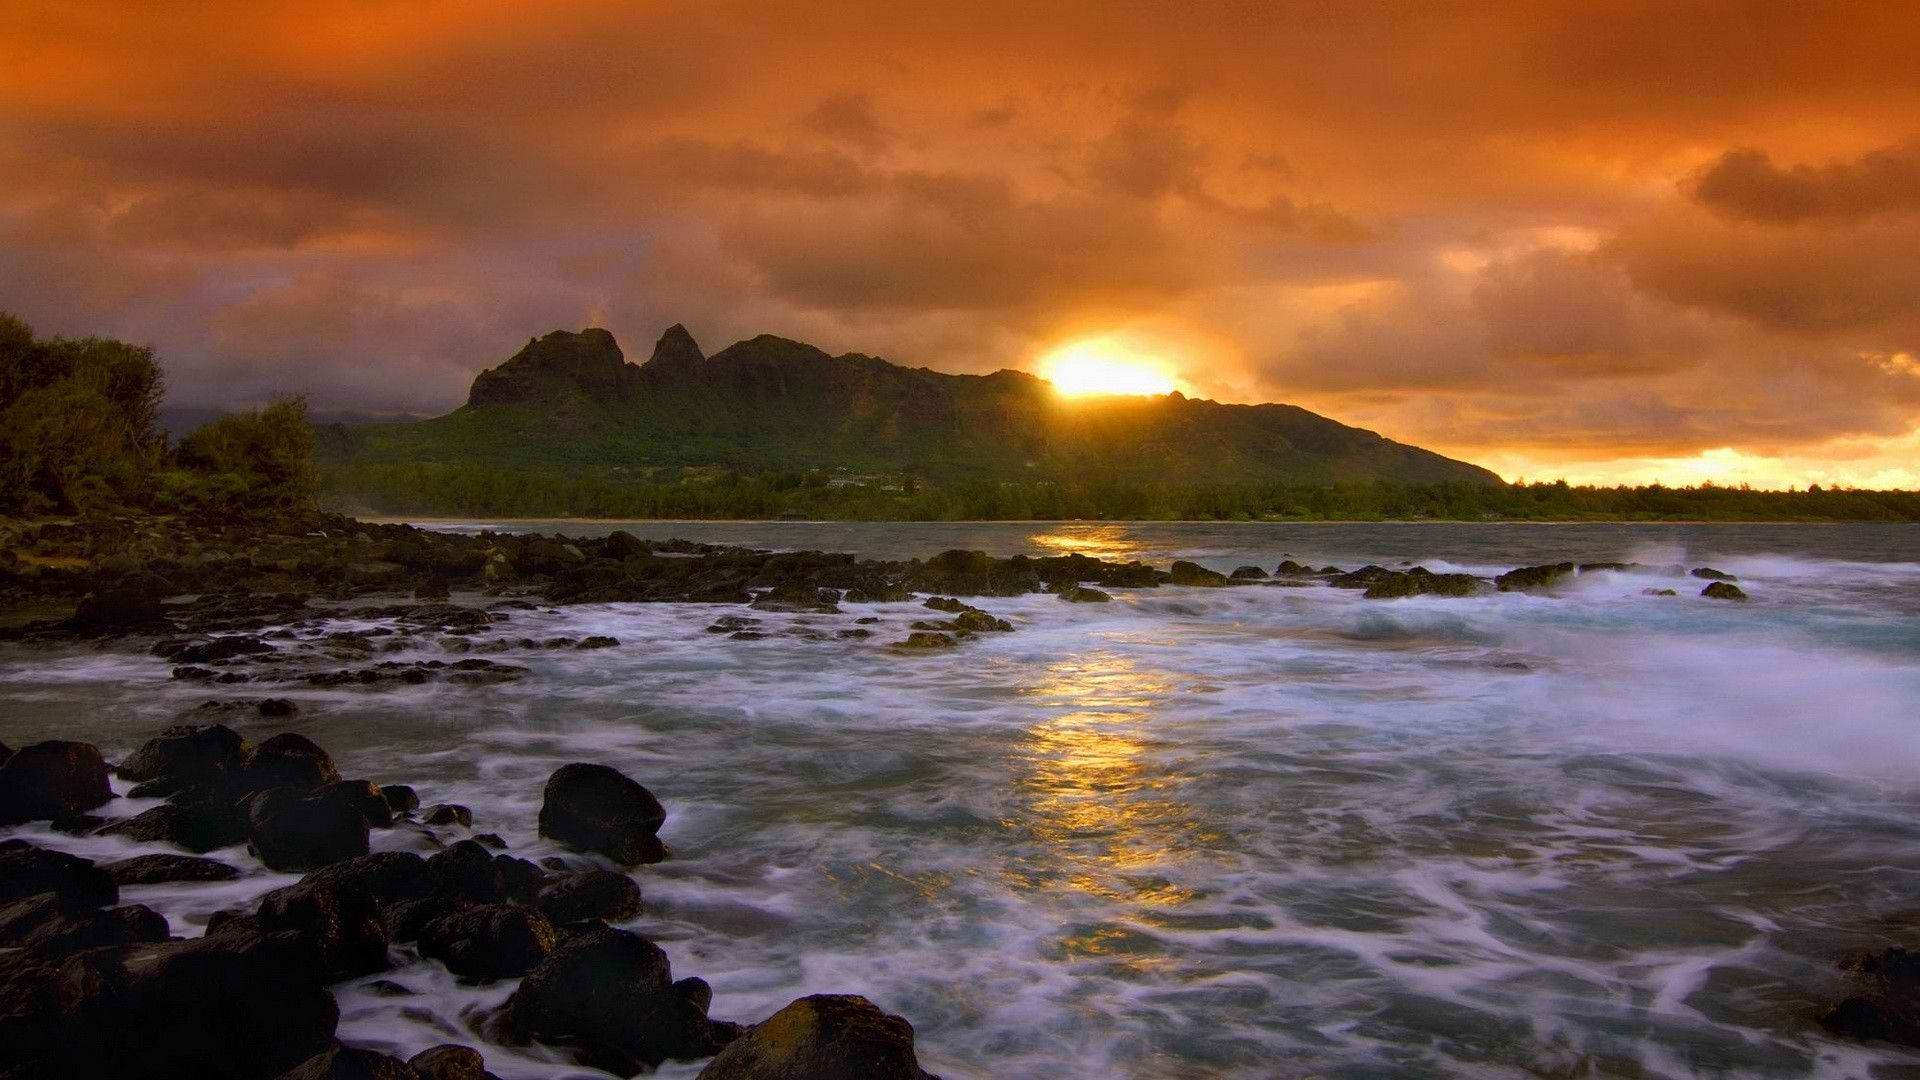 beautiful sunset on seacoast in kauai hawaii hd desktop background wallpaper free